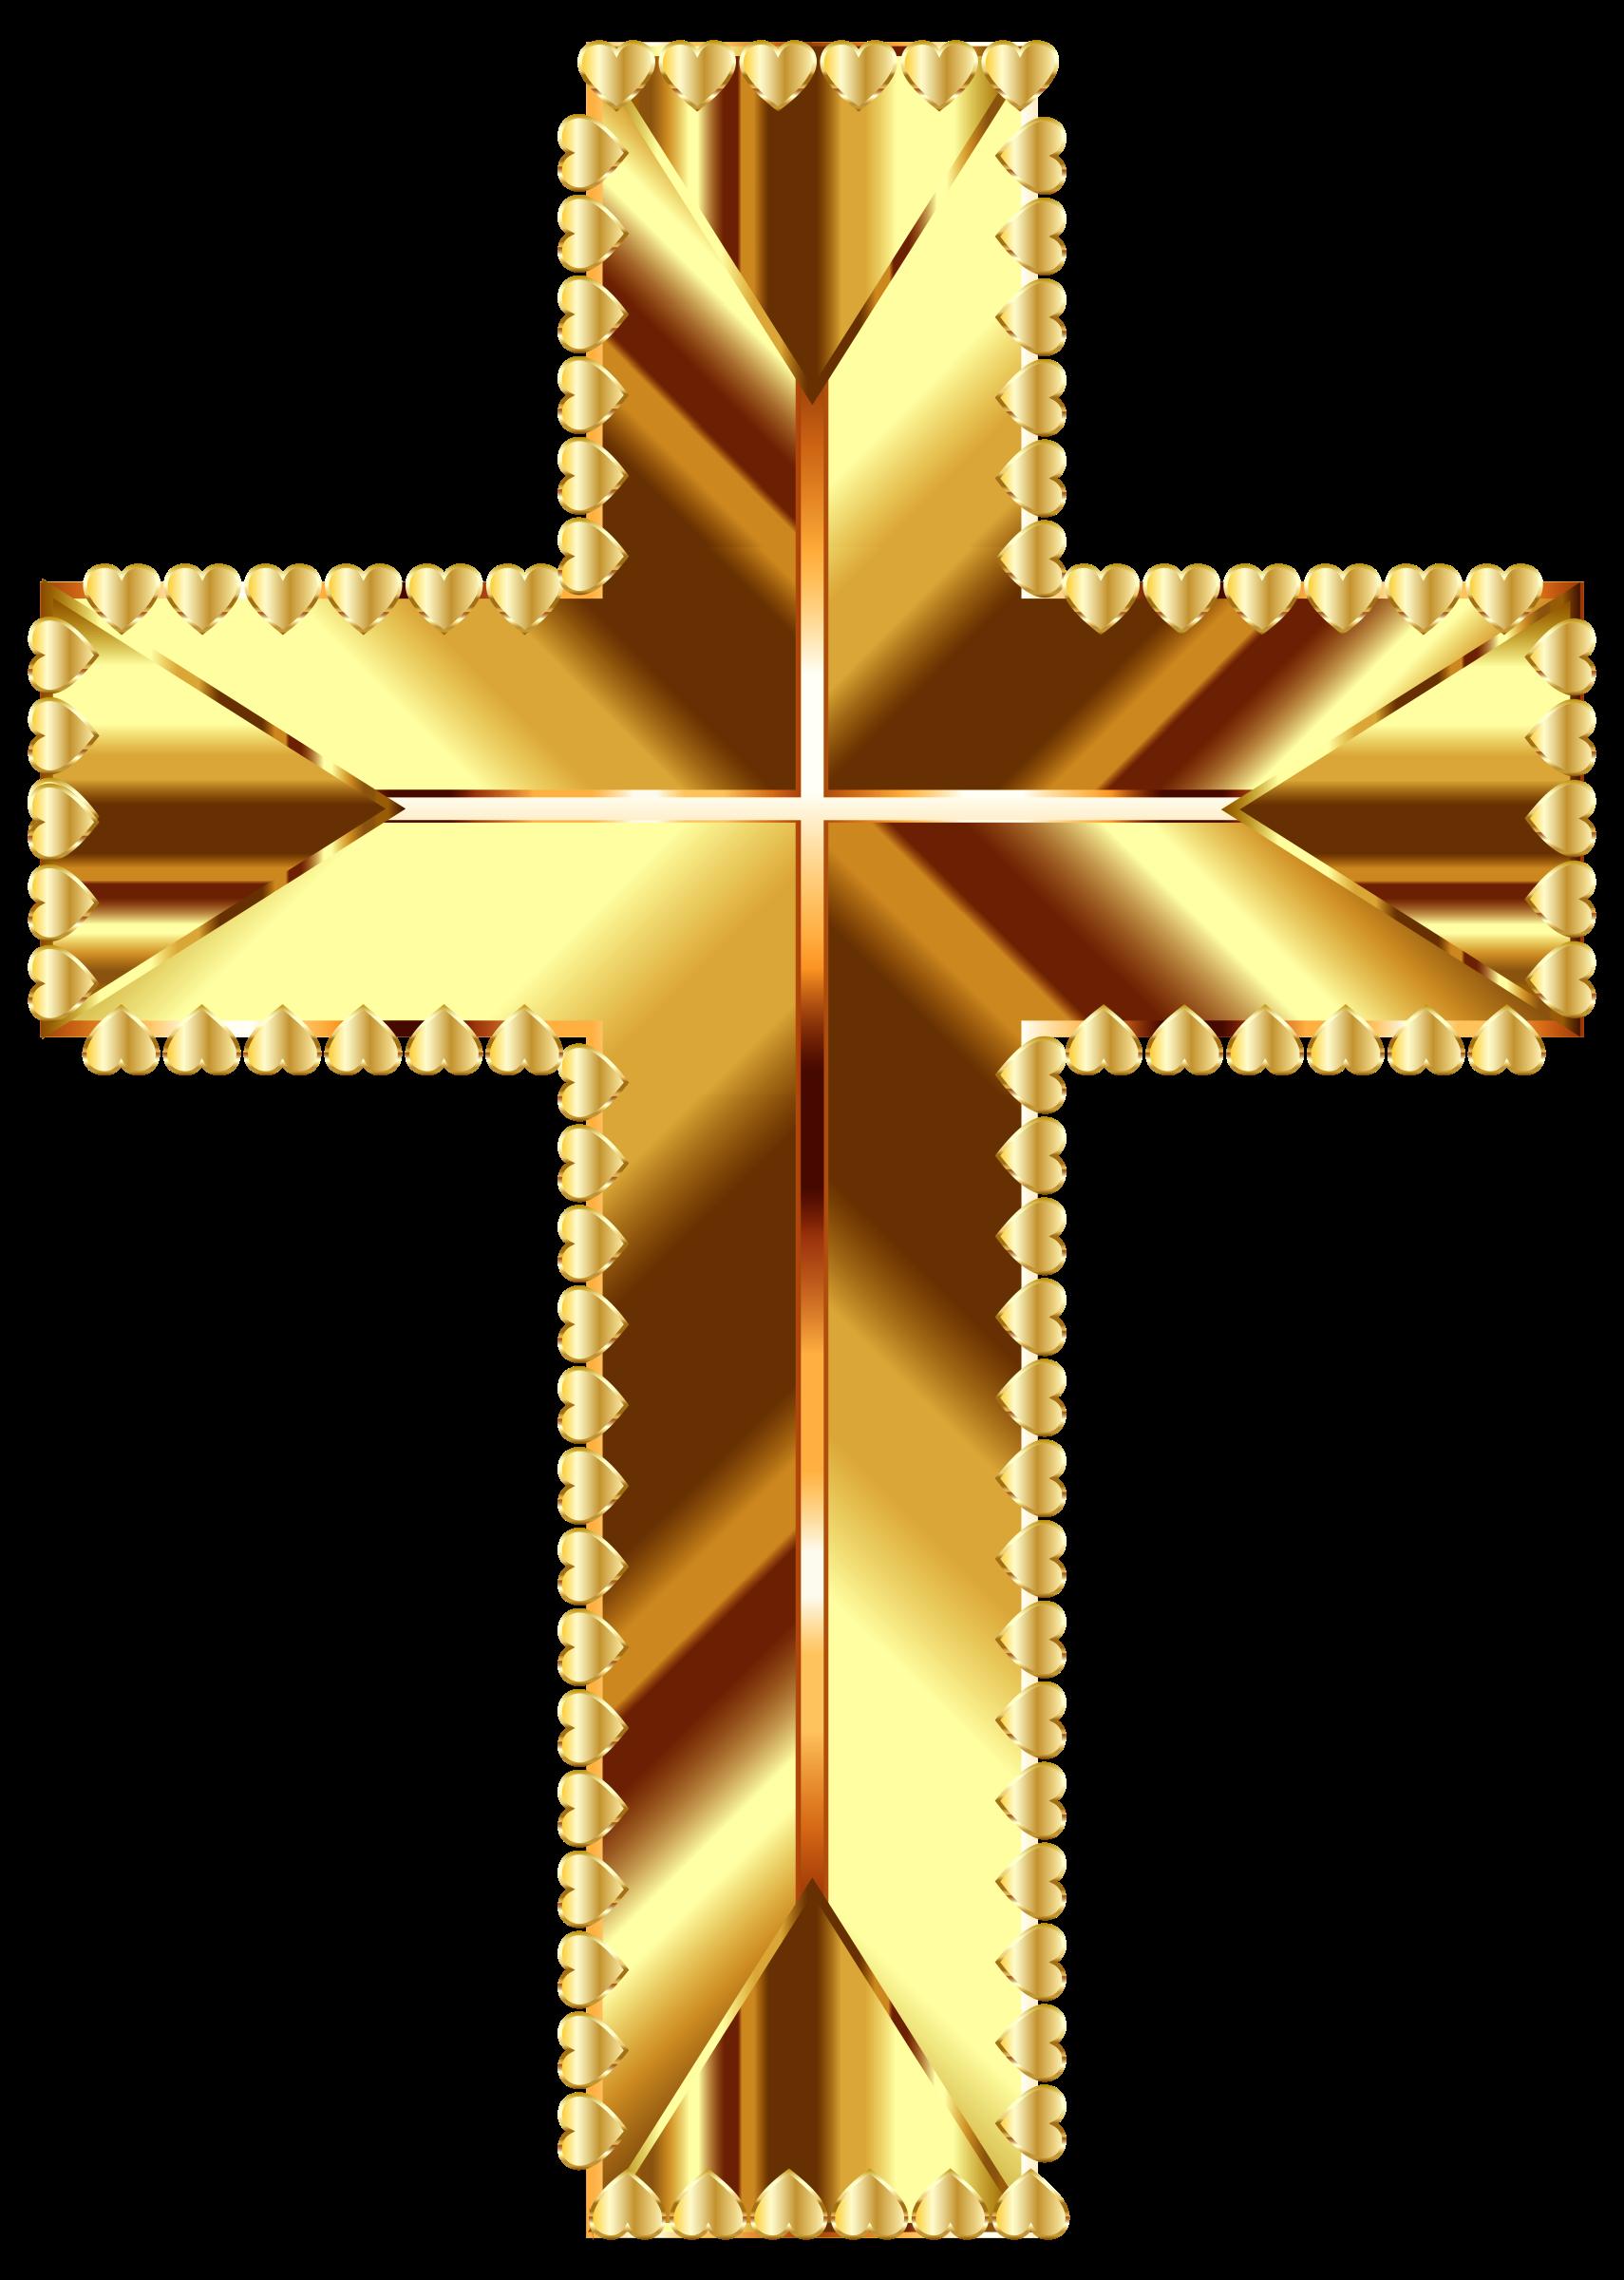 Golden cross love deeper. Color clipart background